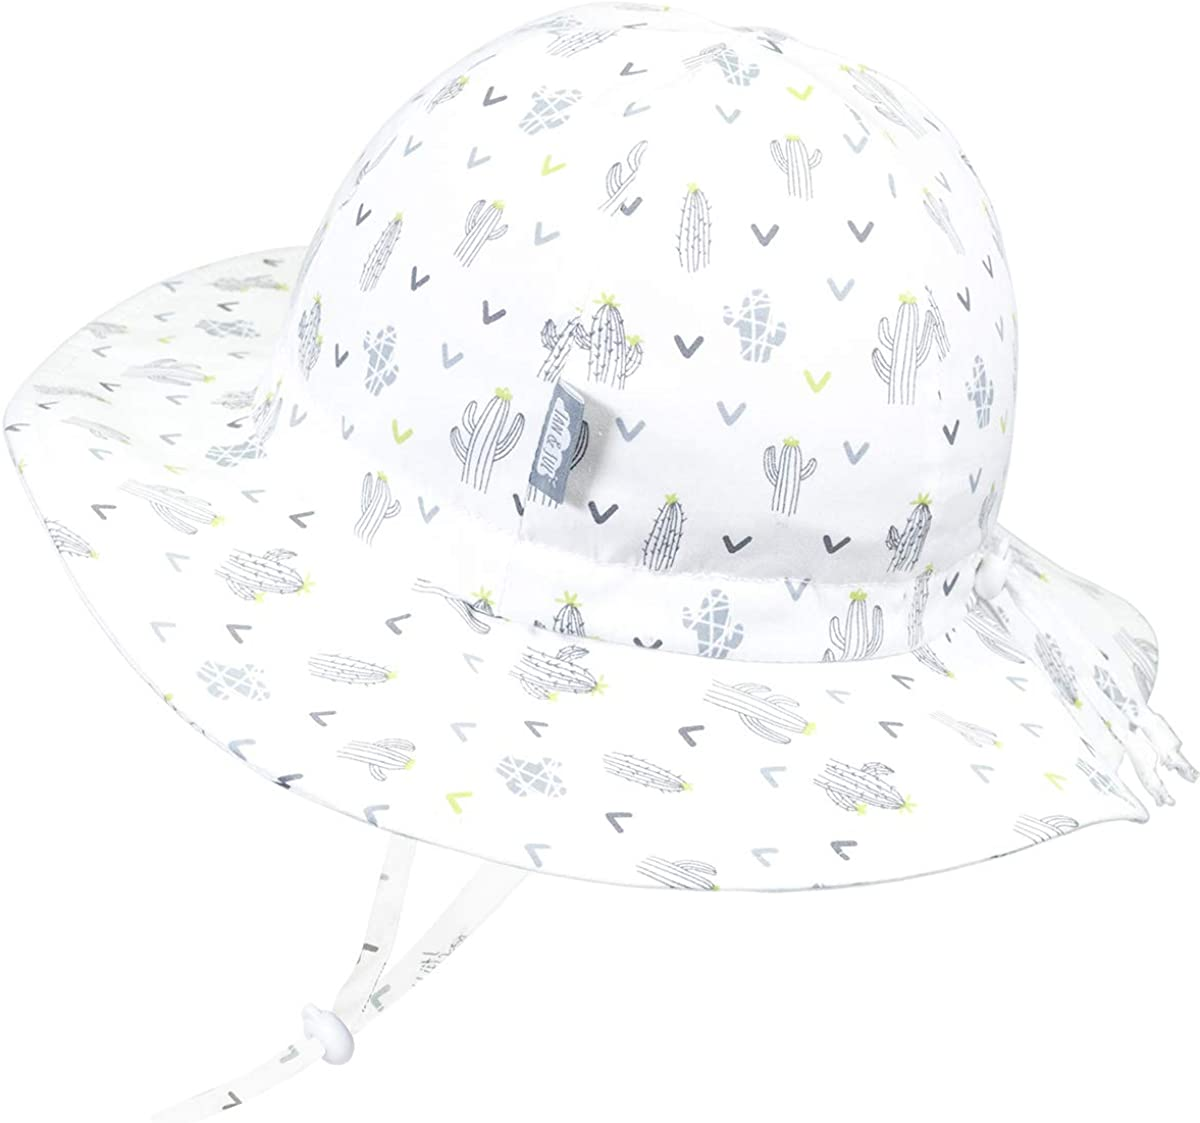 50+UPF Girl or Boy Jan /& Jul Kids Cotton Floppy Sun-Hat for Baby And Toddler Adjustable Straps